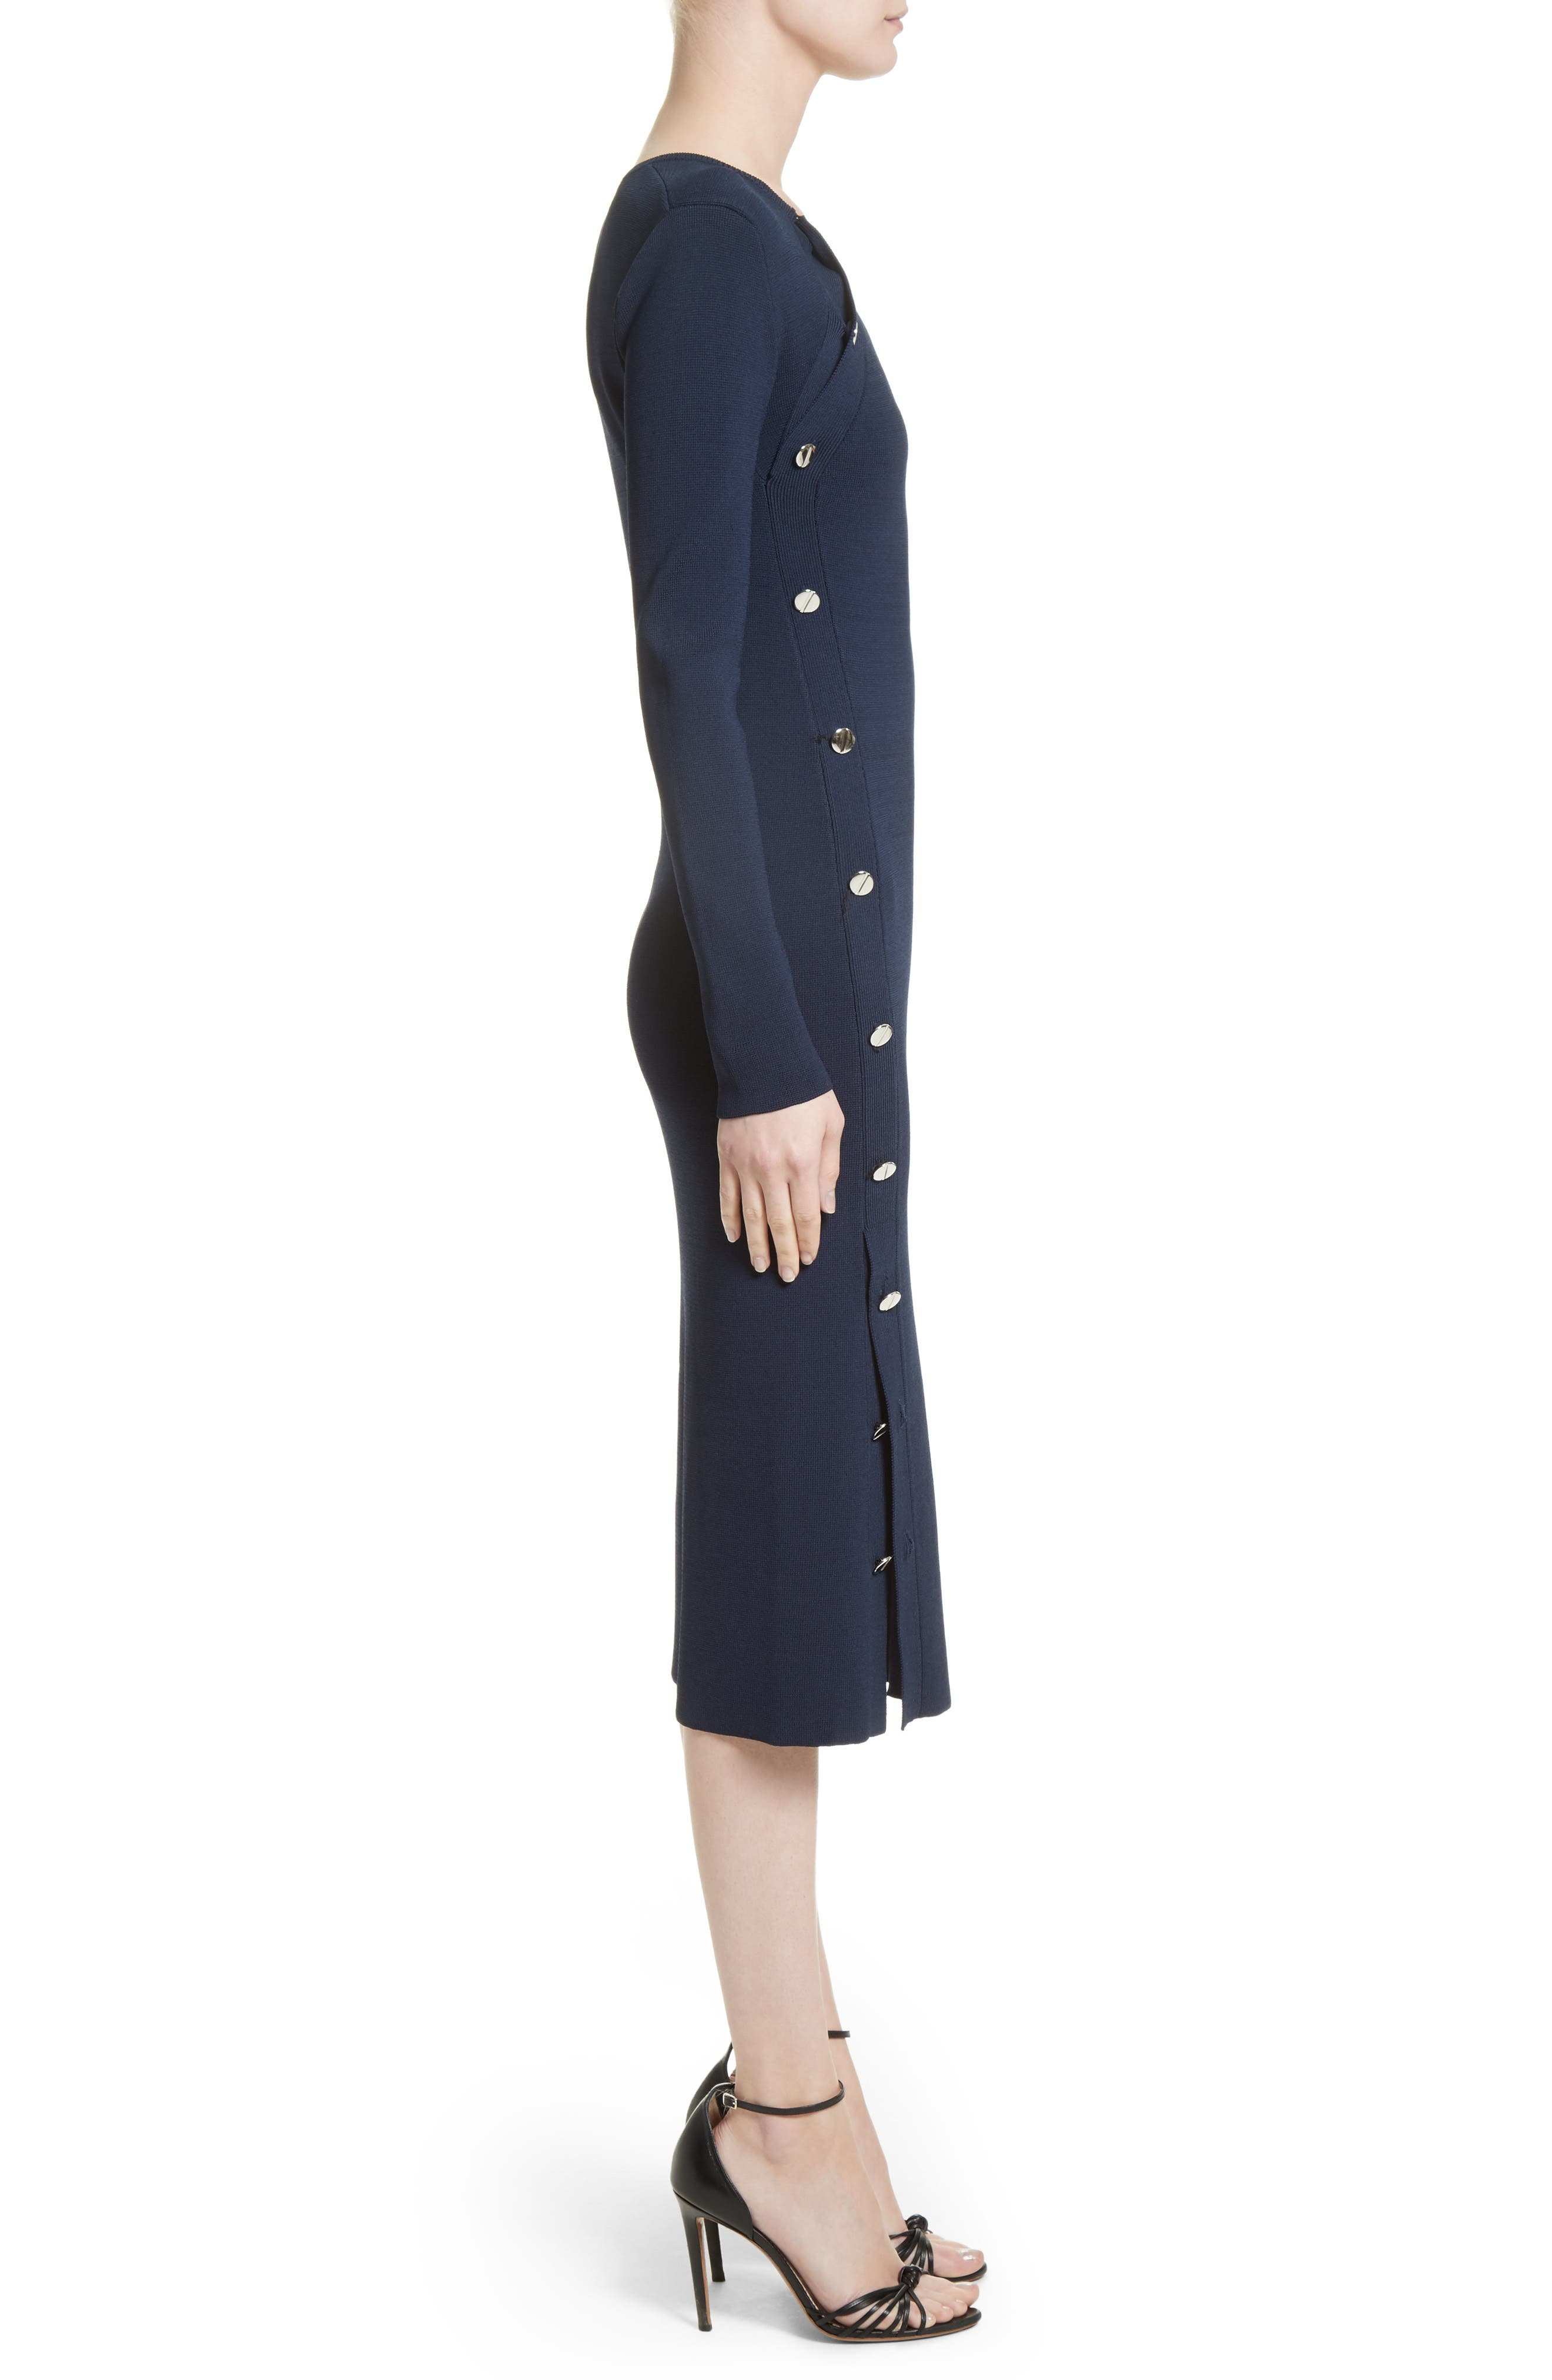 Button Detail Knit Dress,                             Alternate thumbnail 3, color,                             Navy